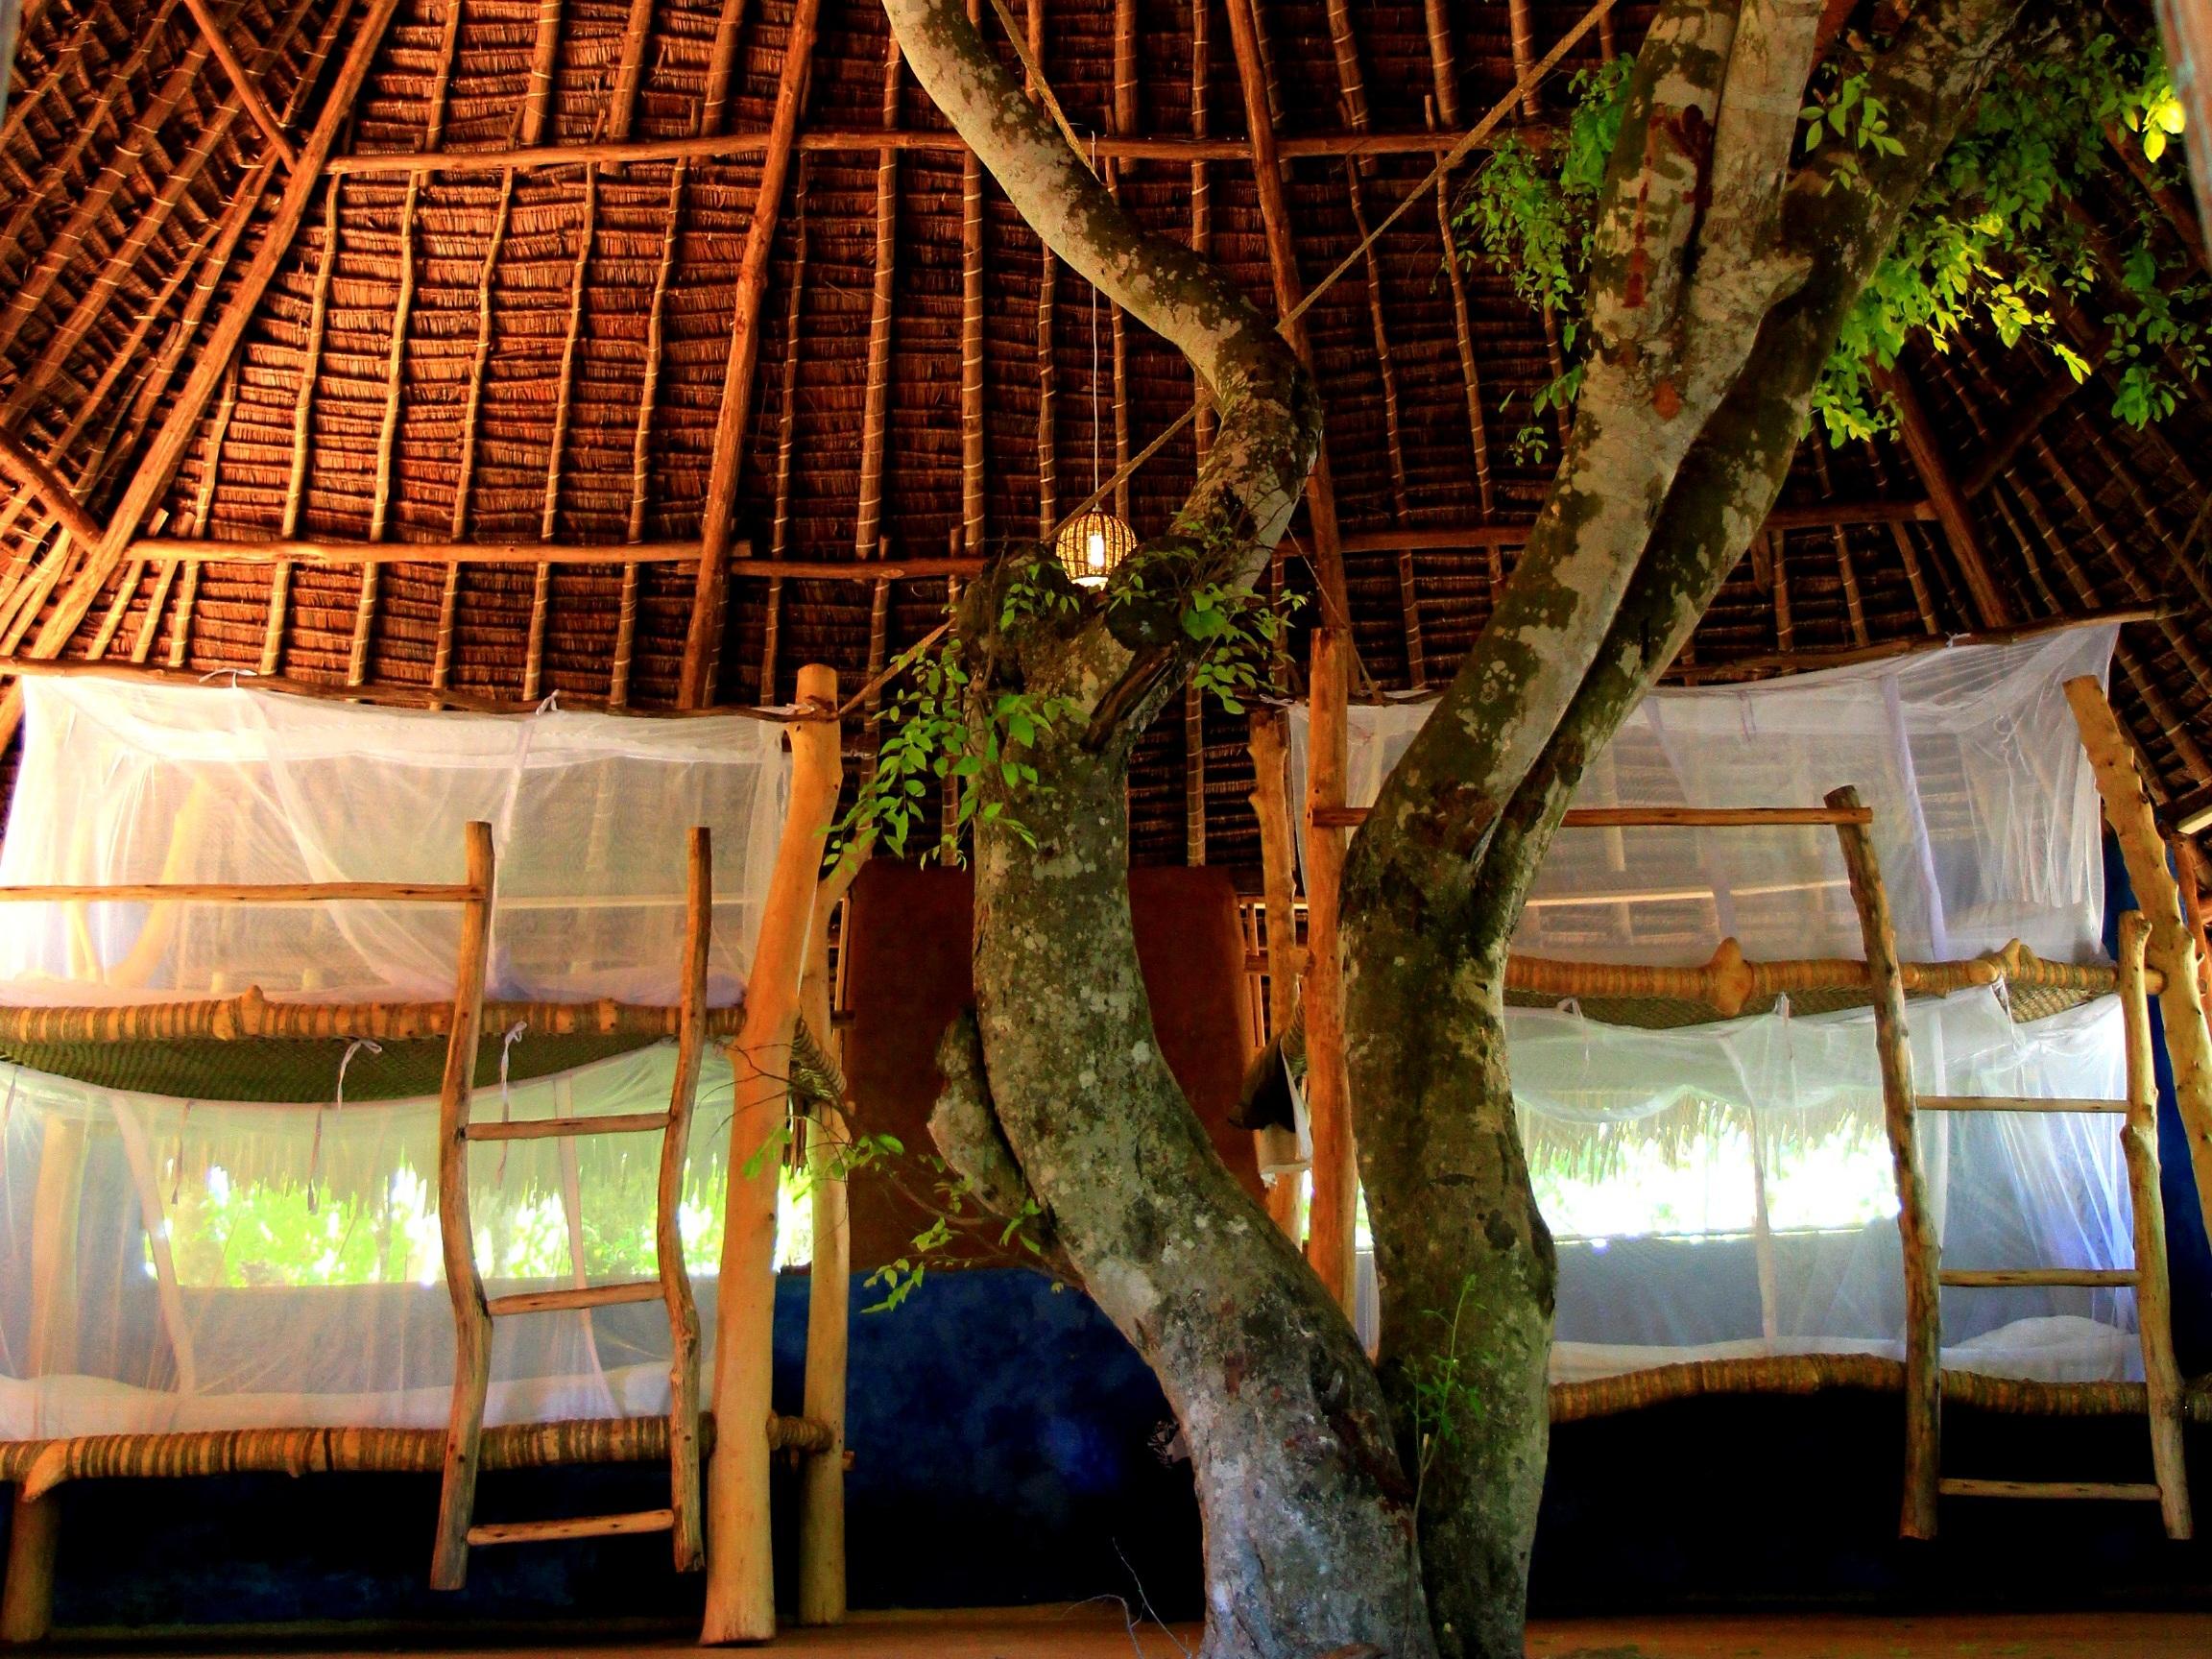 Accommodation Dorm - remote work and travel program.jpg